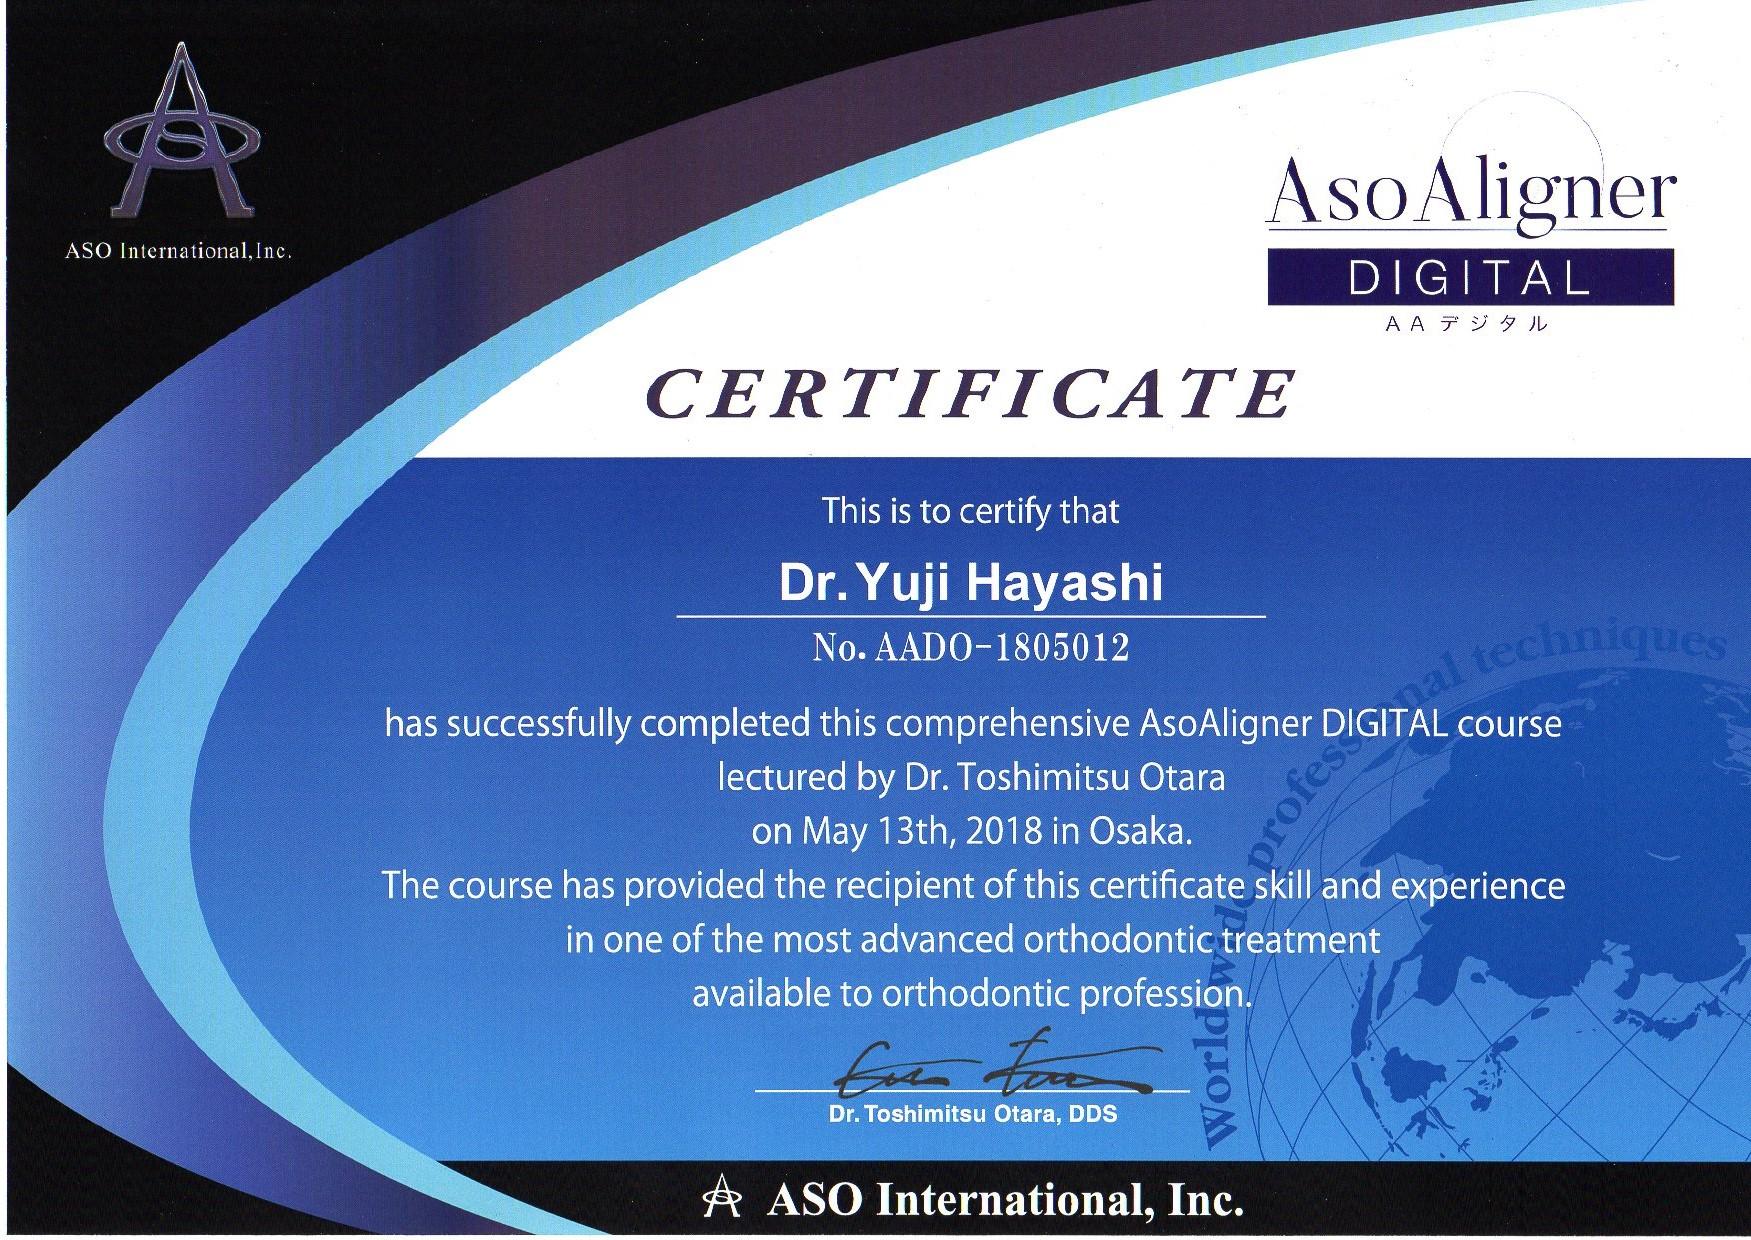 http://www.hayashi-dental.info/img010.jpg